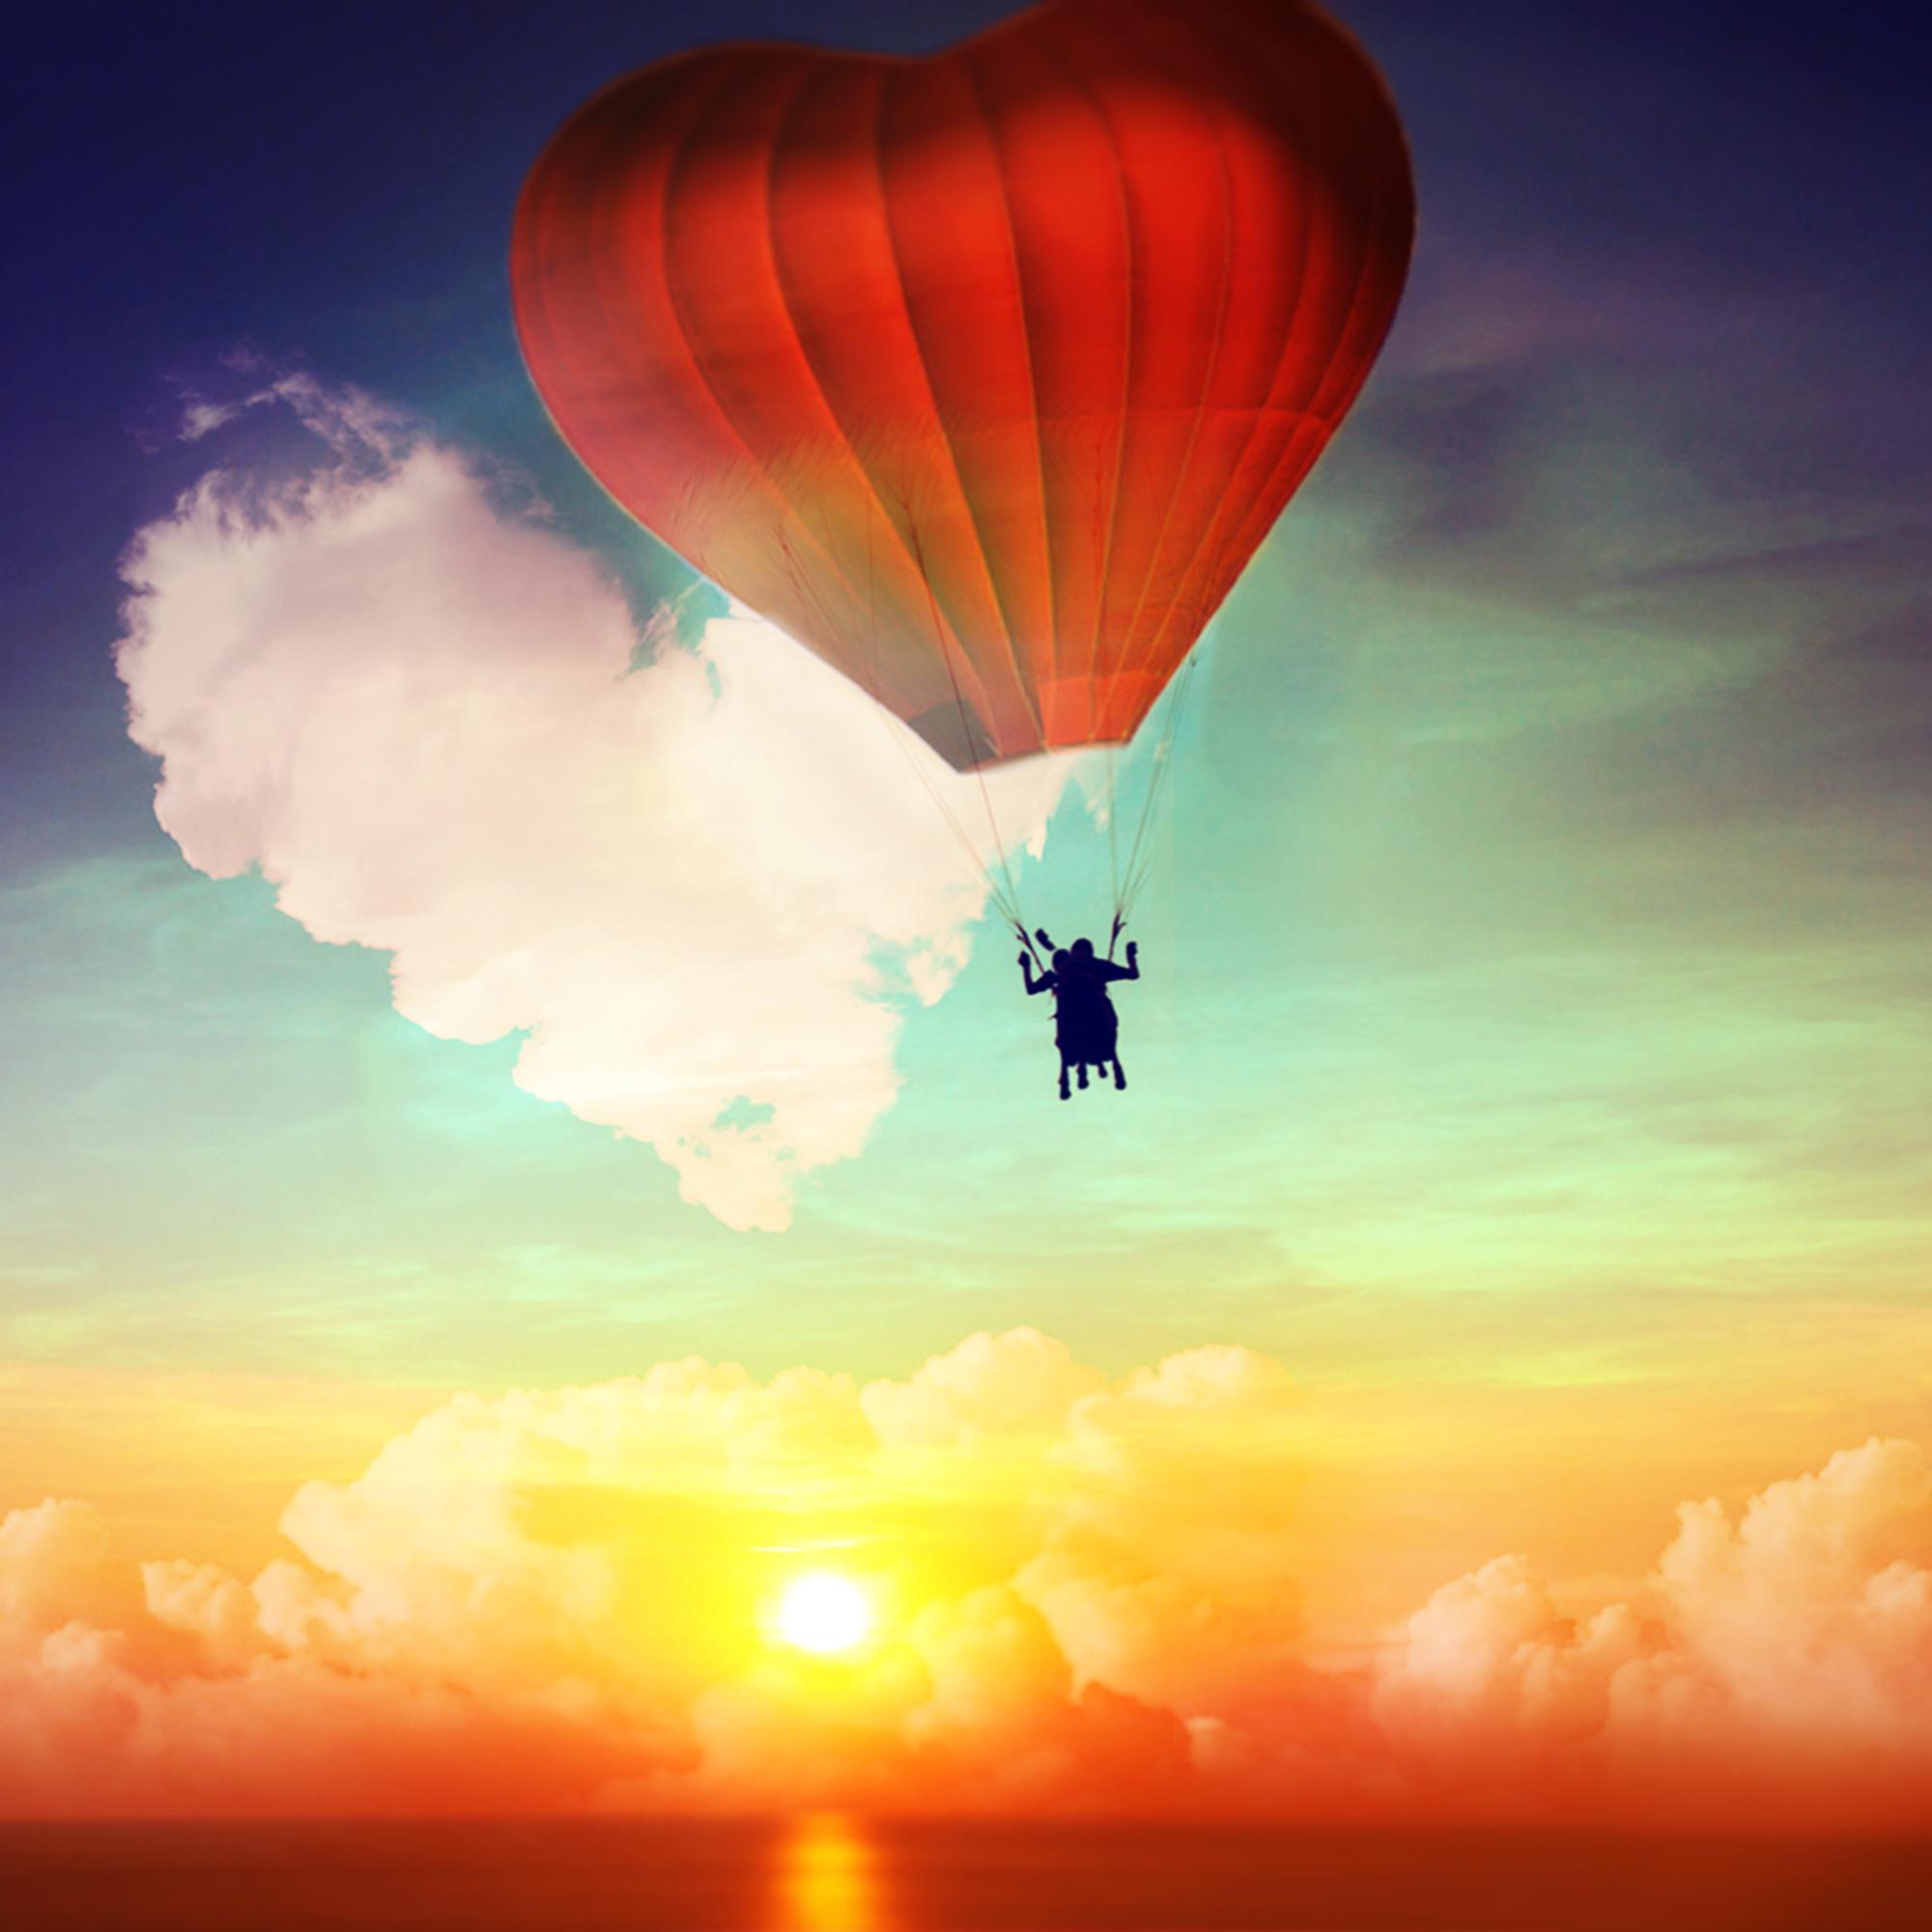 Romantischer Fallschirmsprung durch Wolke 7 - 2